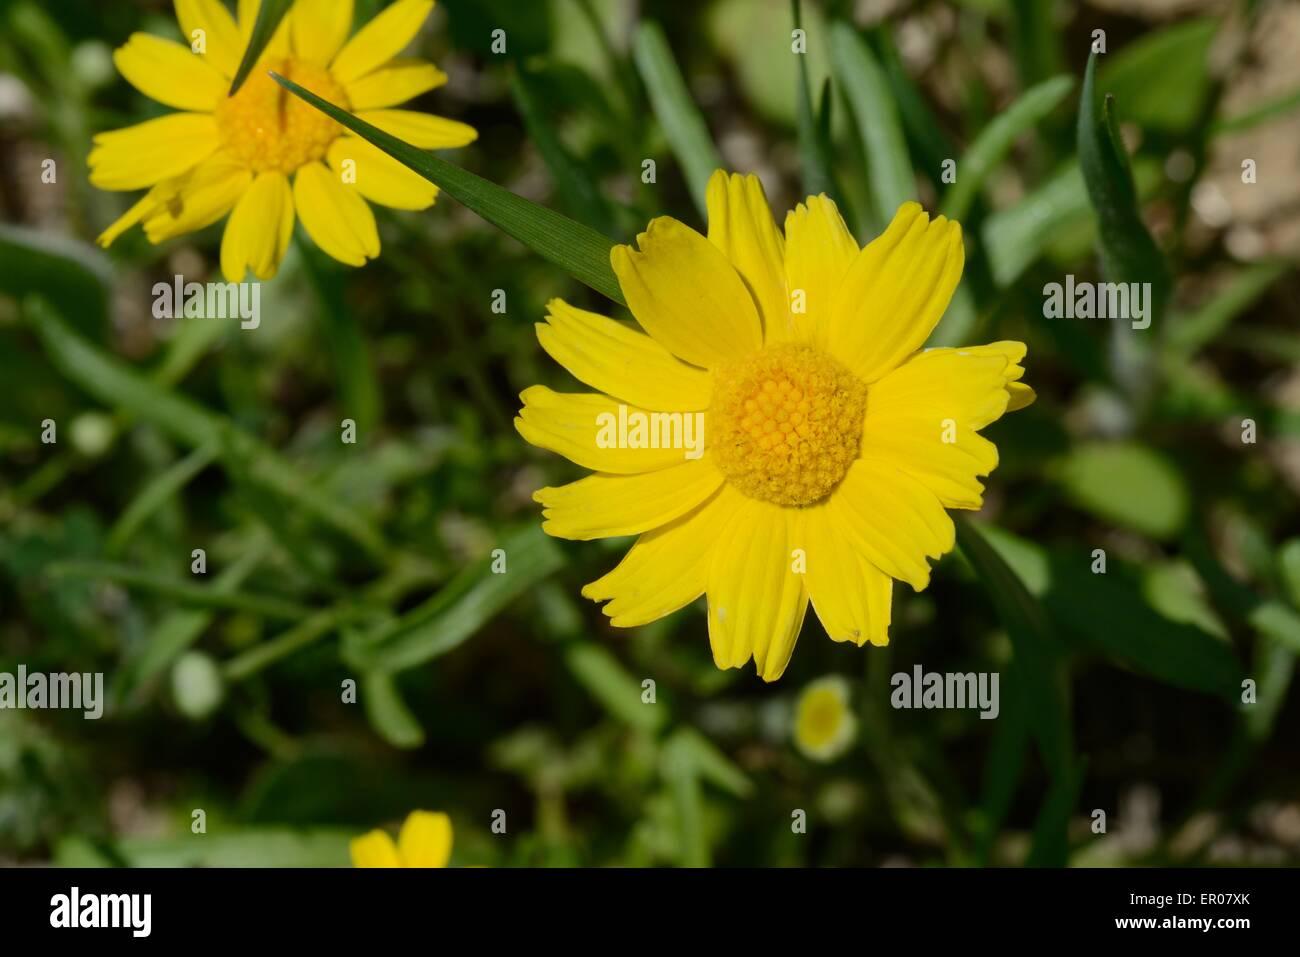 Four-nerve daisy - Stock Image